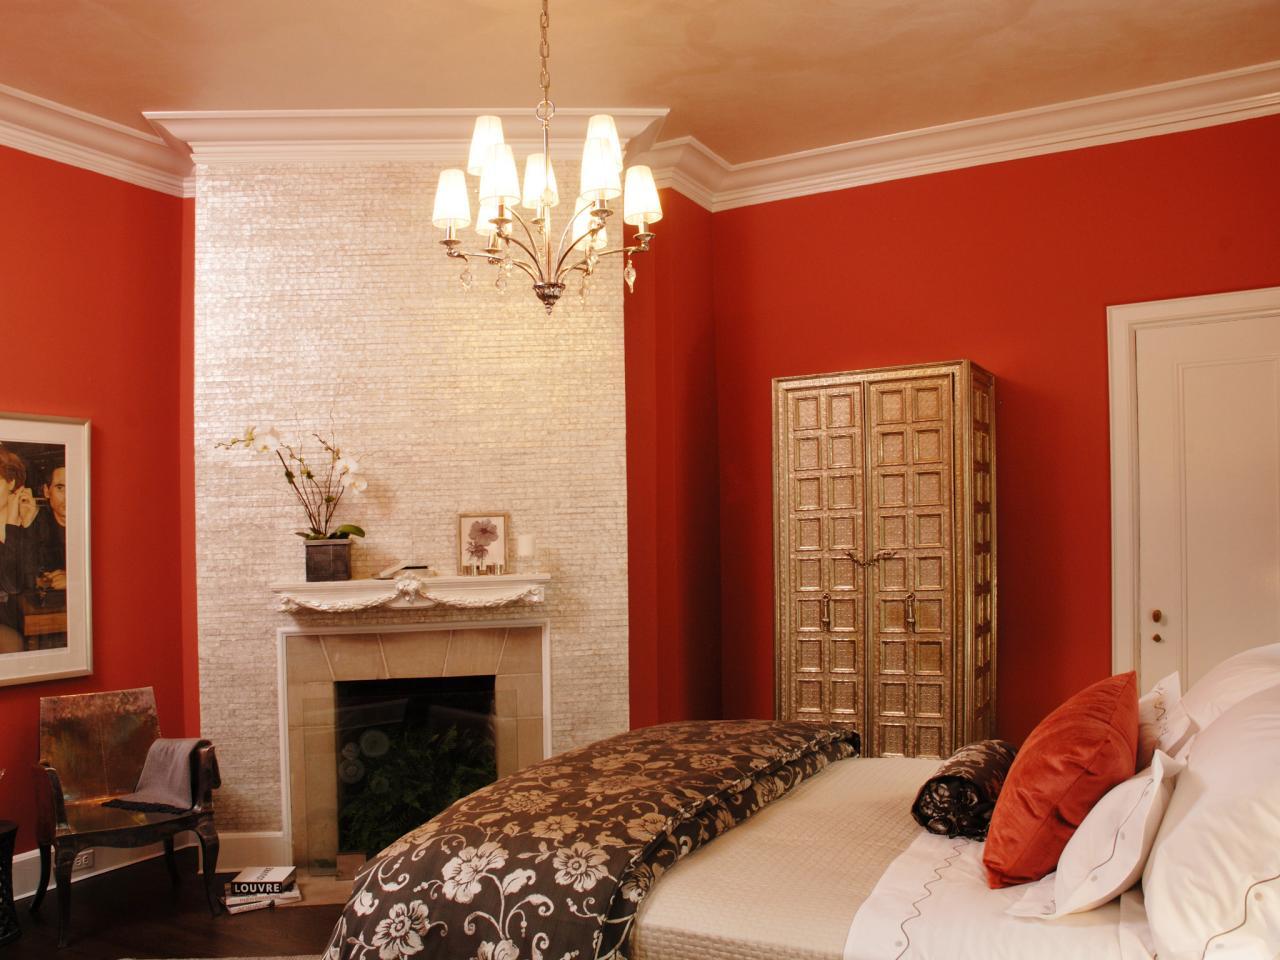 DP_Marlaina-Teich-Modern-Orange-Bedroom_4x3